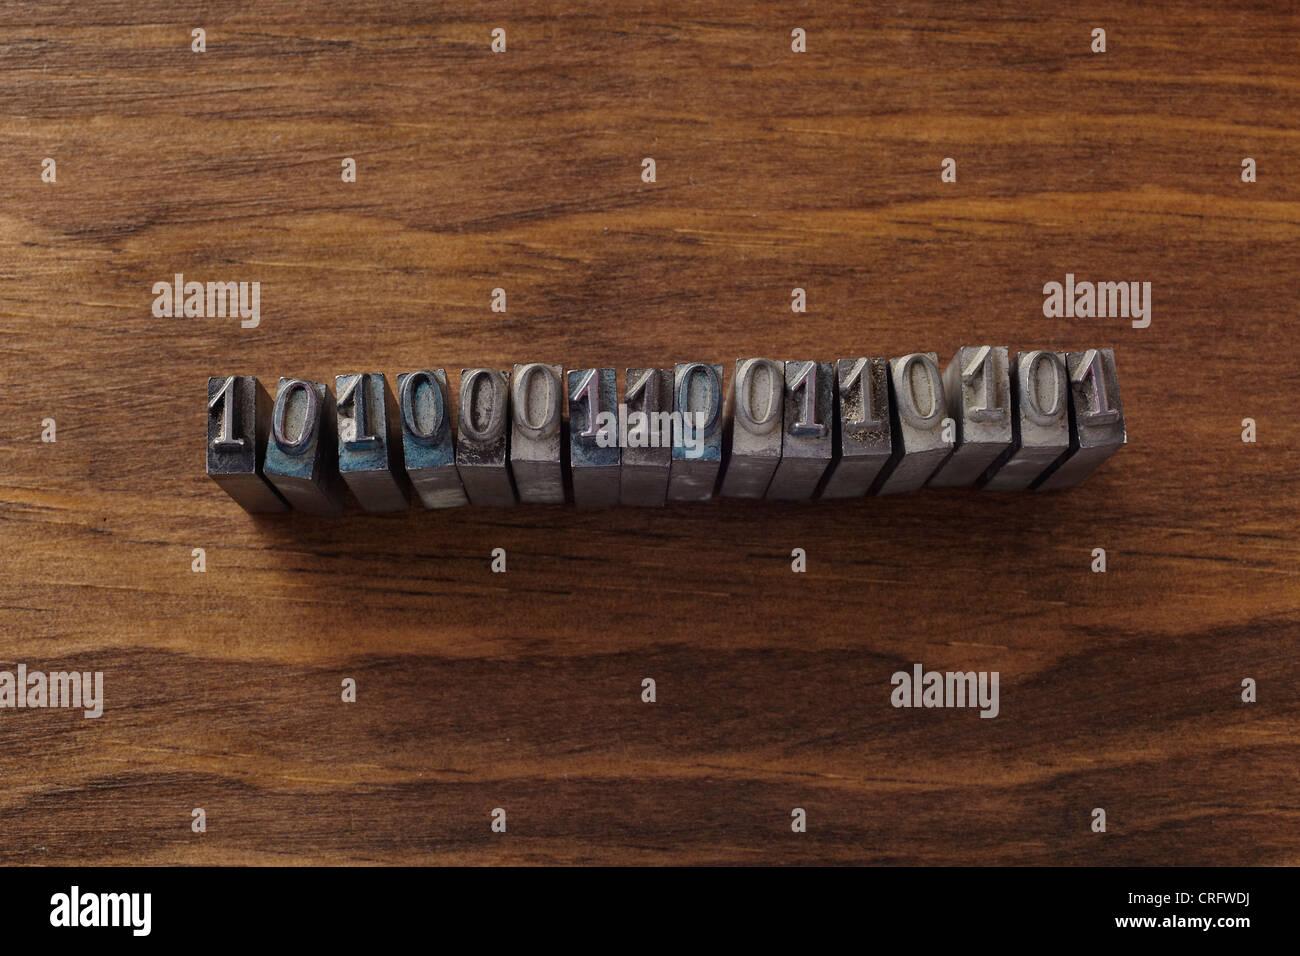 Lead type spelling binary code - Stock Image